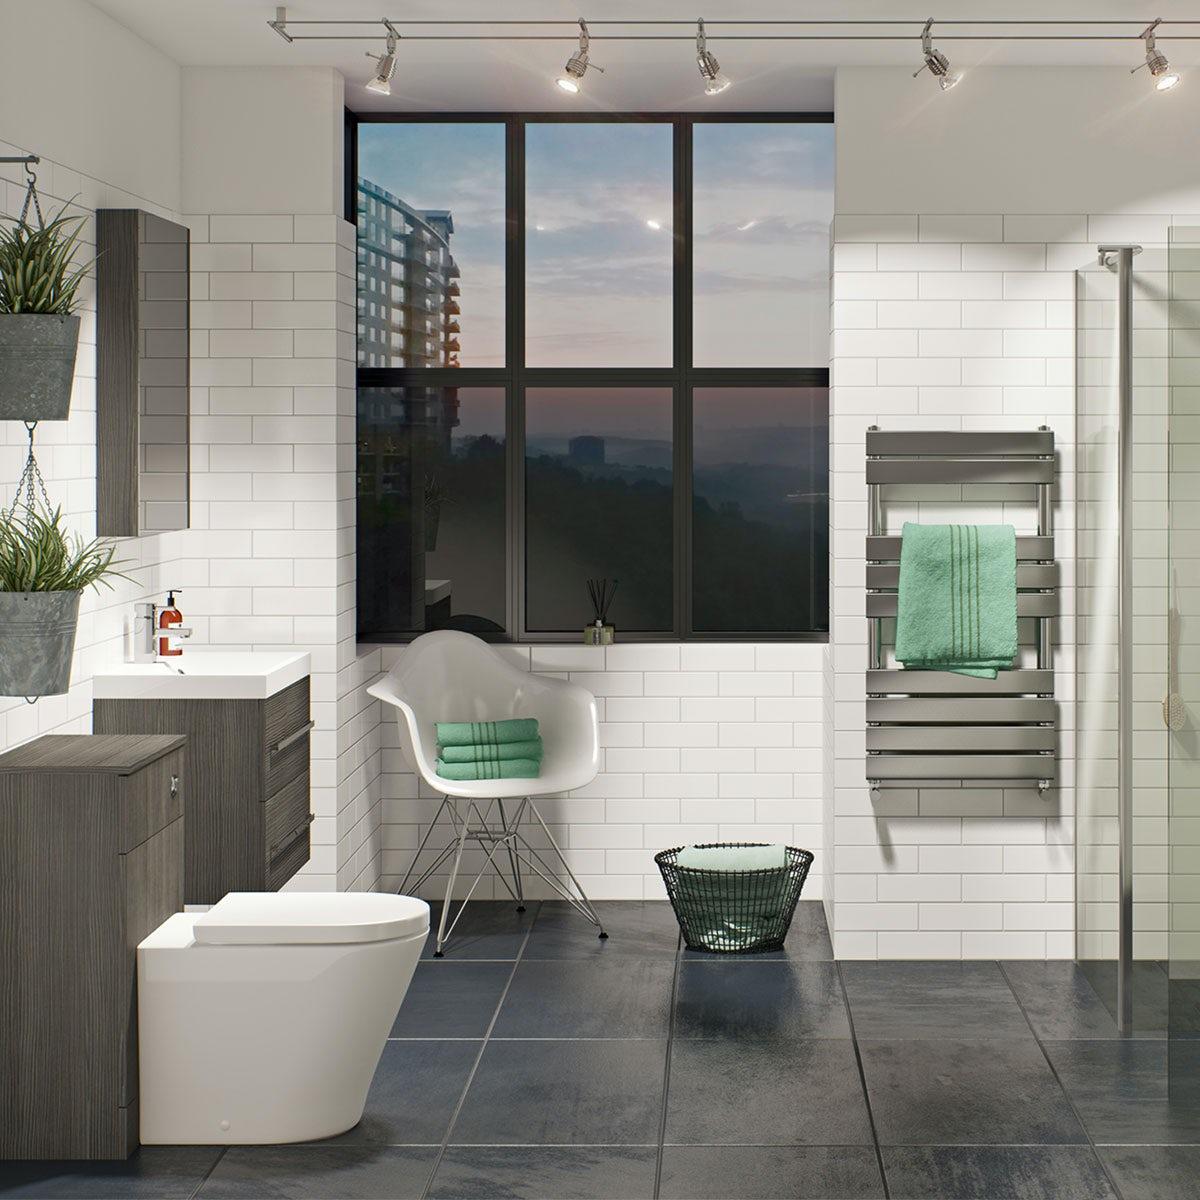 British ceramic tile canvas charcoal grey matt tile 331mm x 331mm british ceramic tile canvas charcoal grey matt tile 331mm x 331mm dailygadgetfo Images